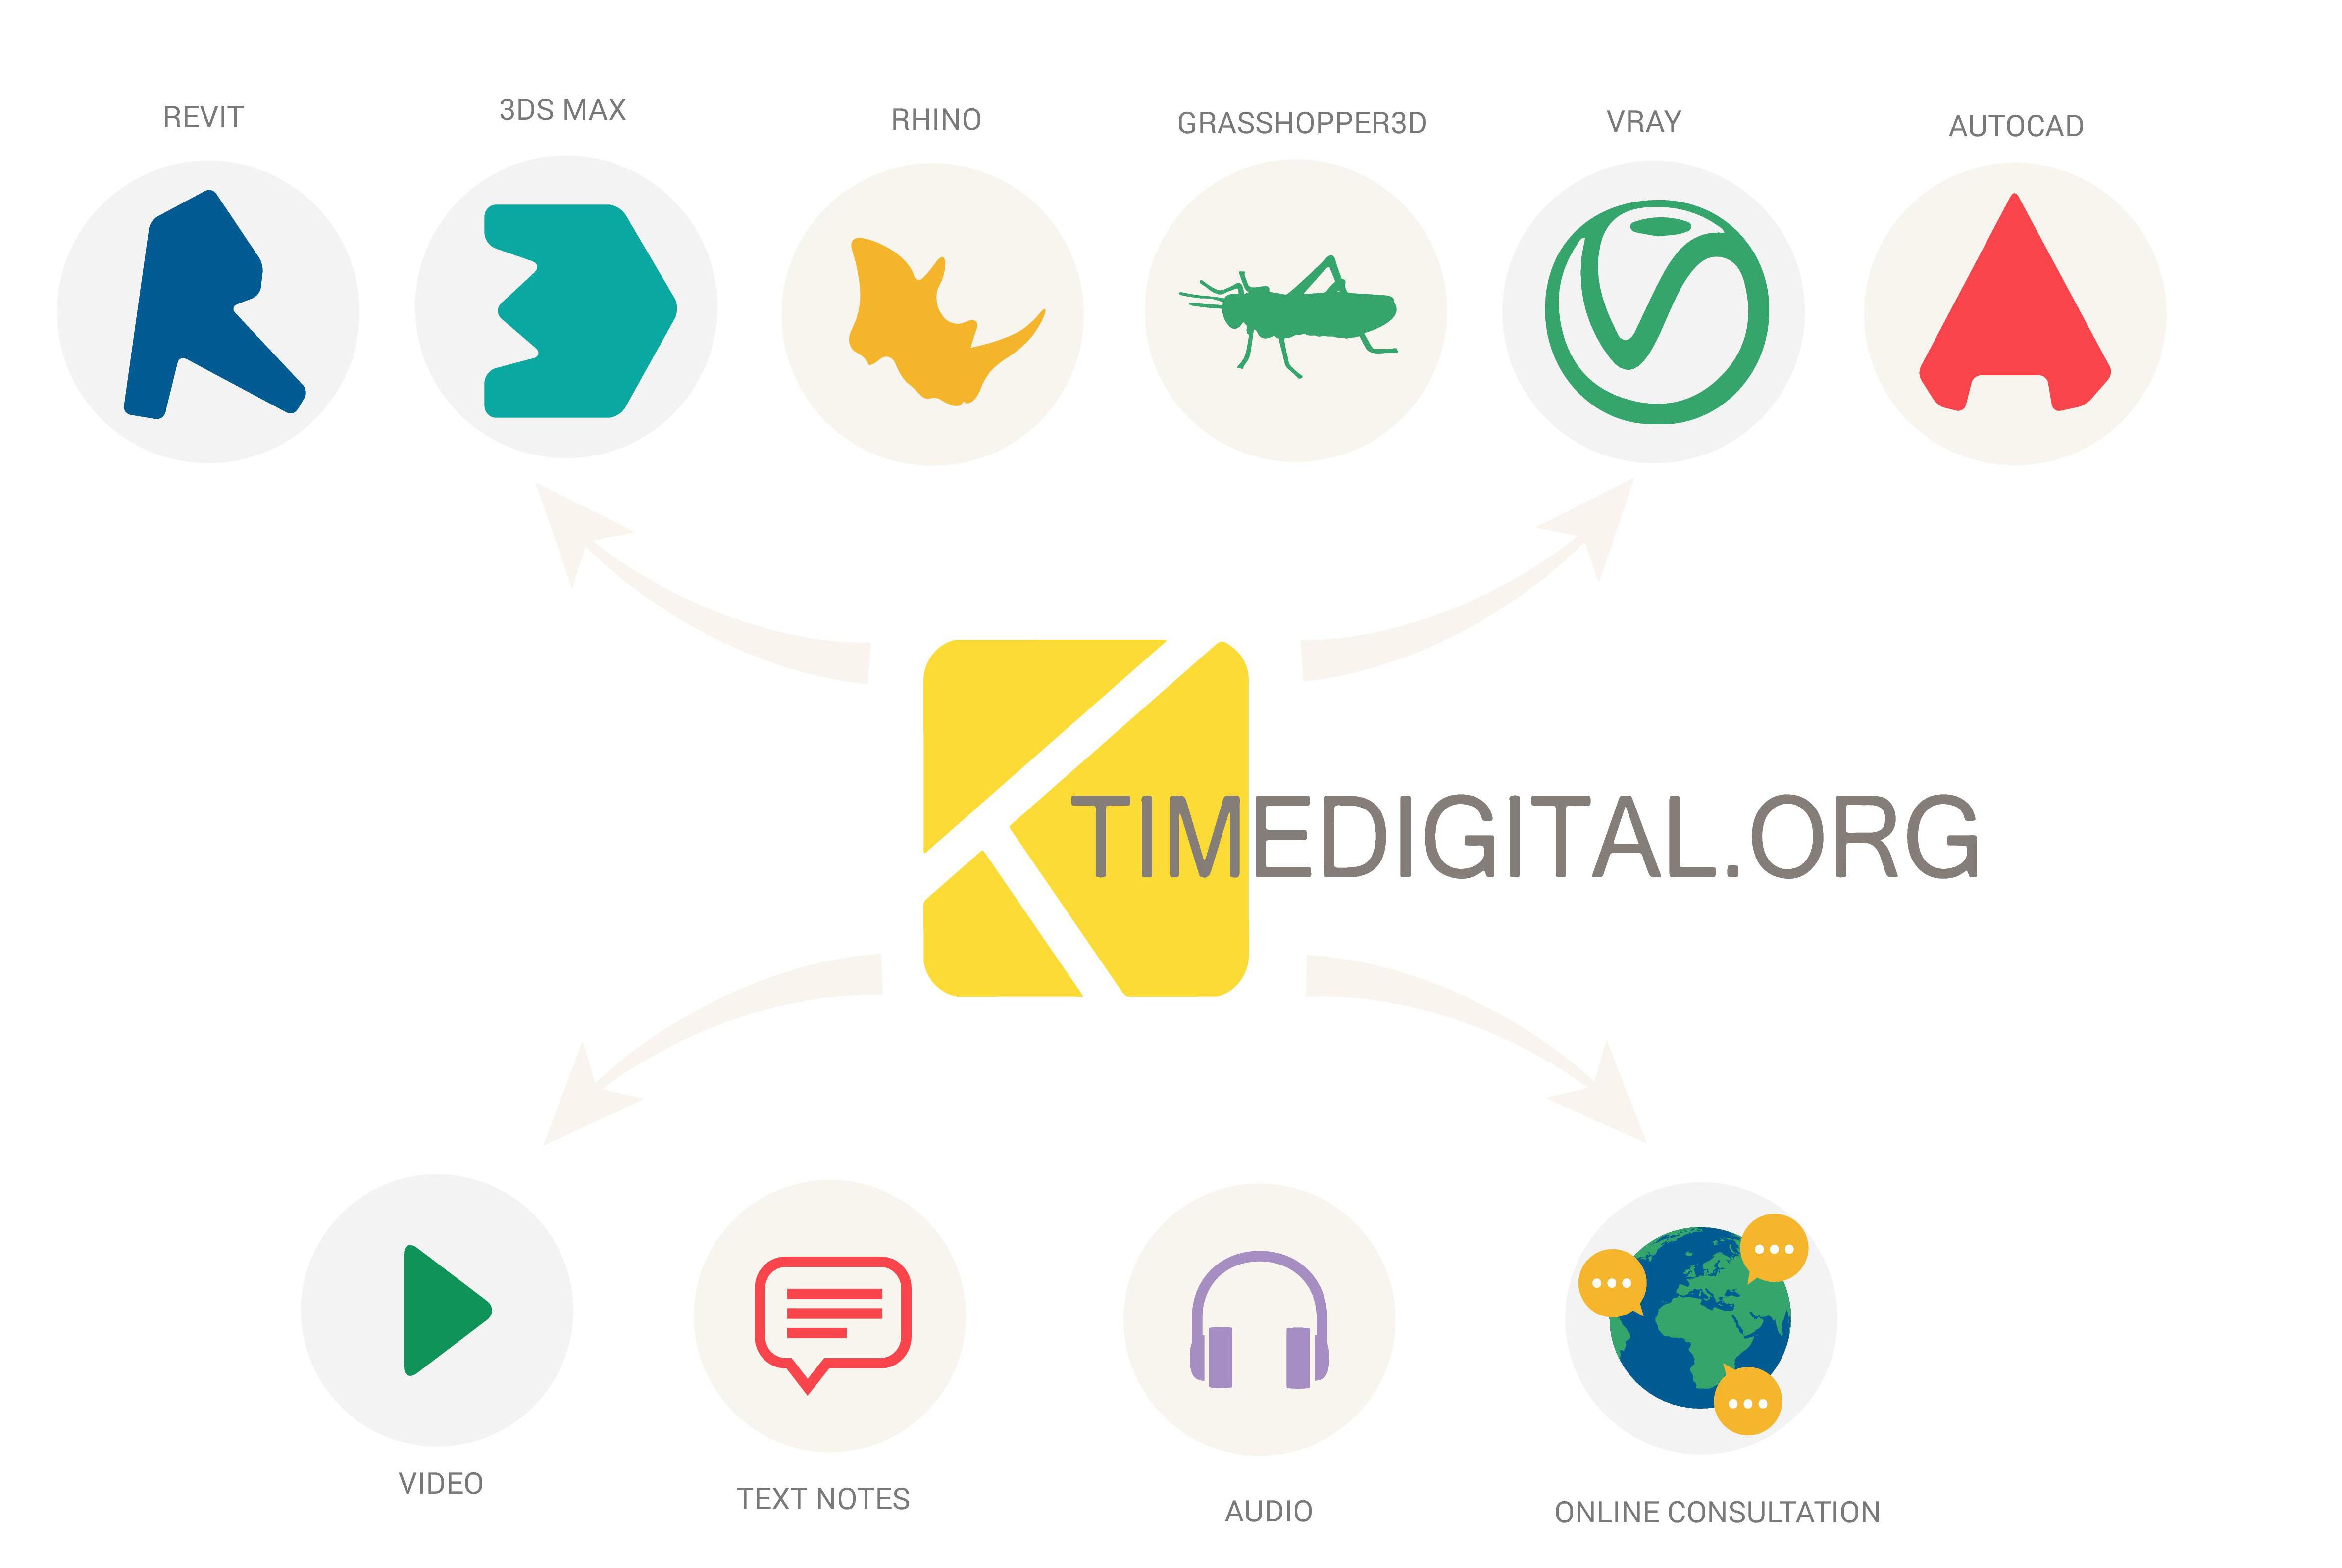 Timedigital